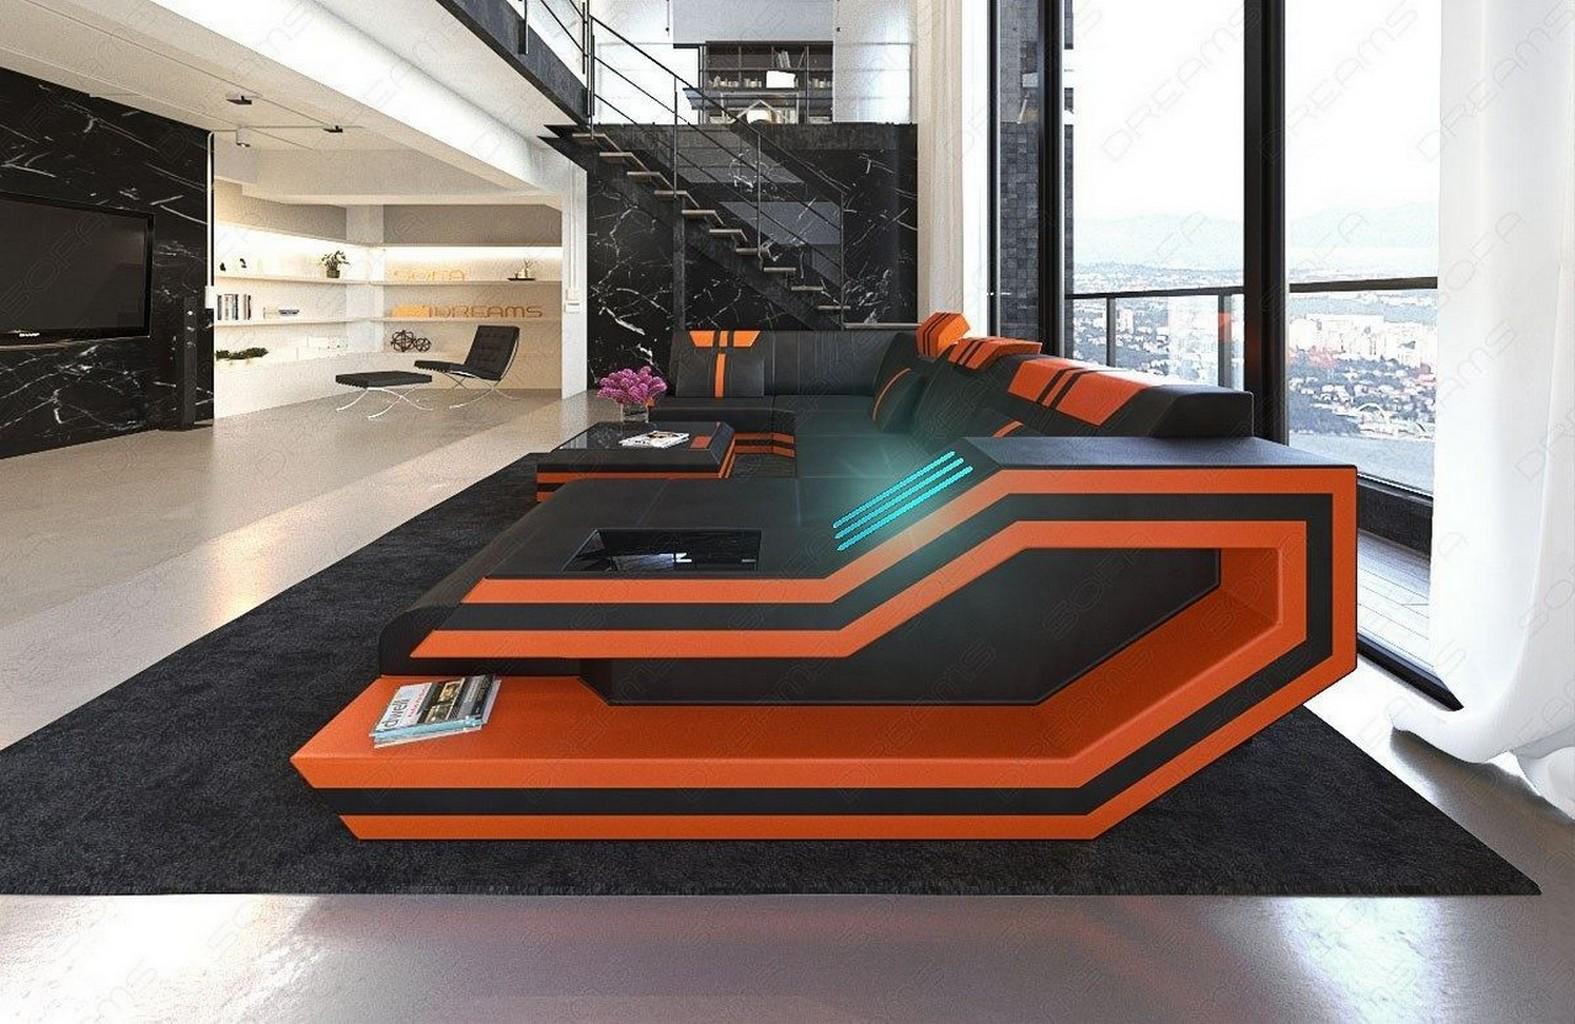 leather sofa interior design ravenna u shape with led. Black Bedroom Furniture Sets. Home Design Ideas